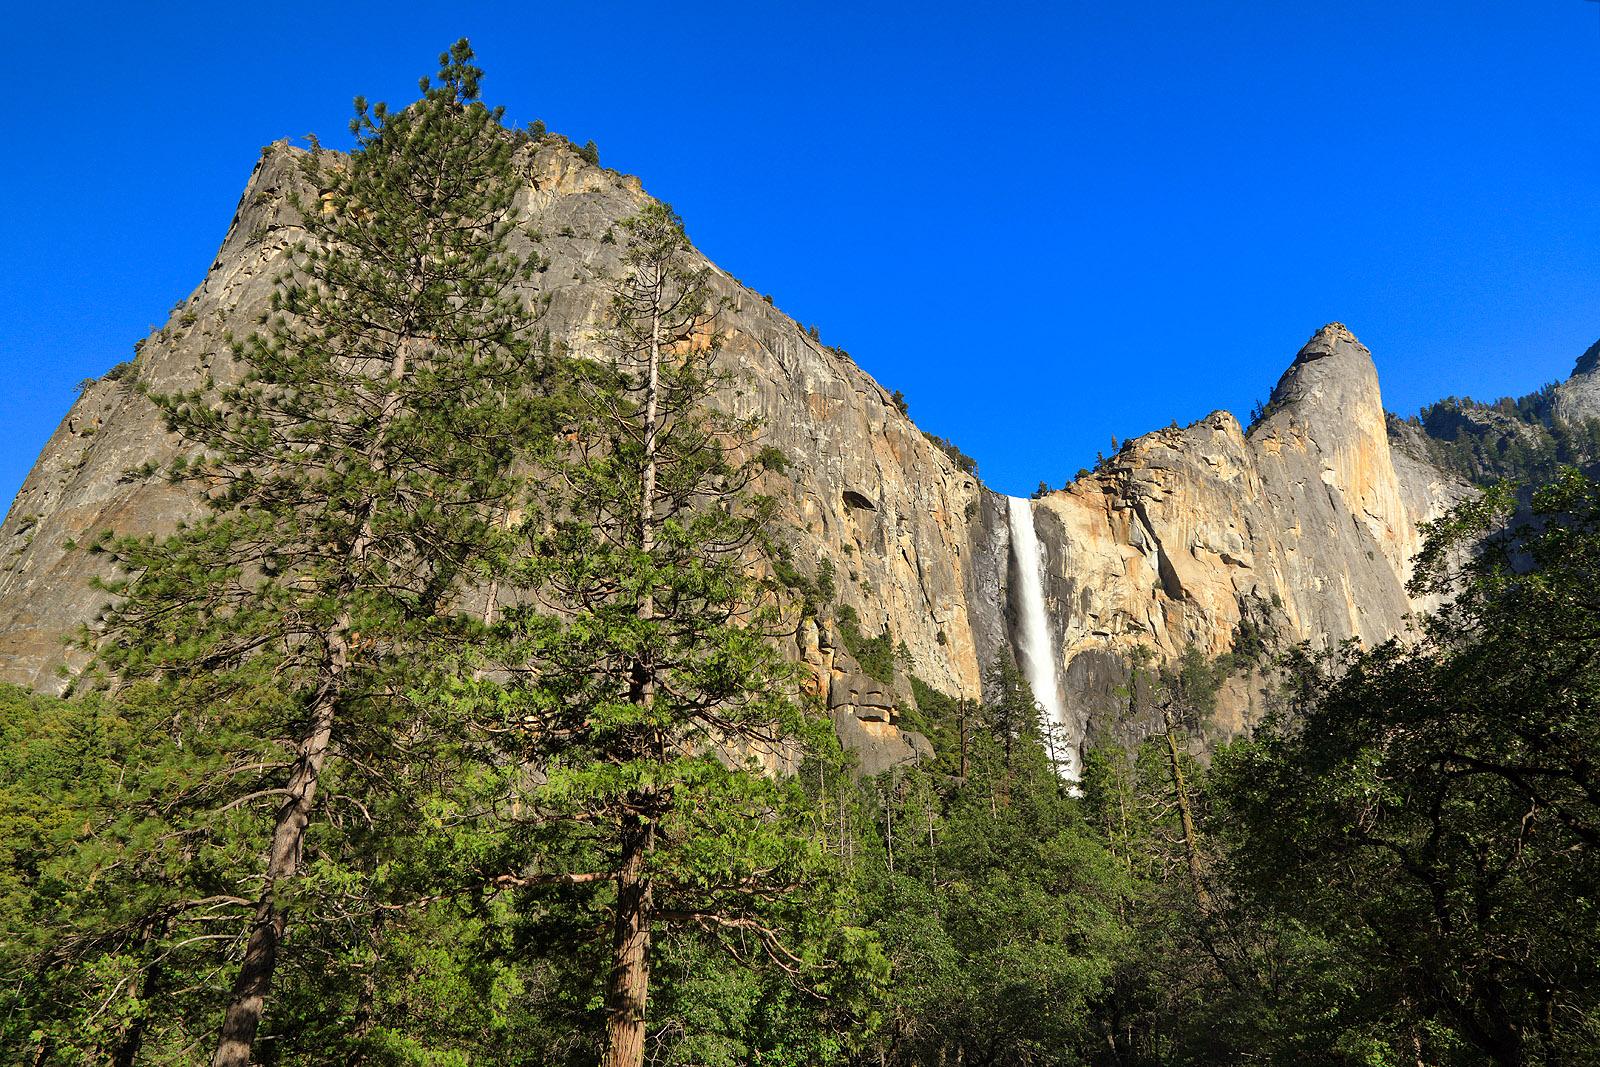 Towering Heights-Yosemite National Park, USA